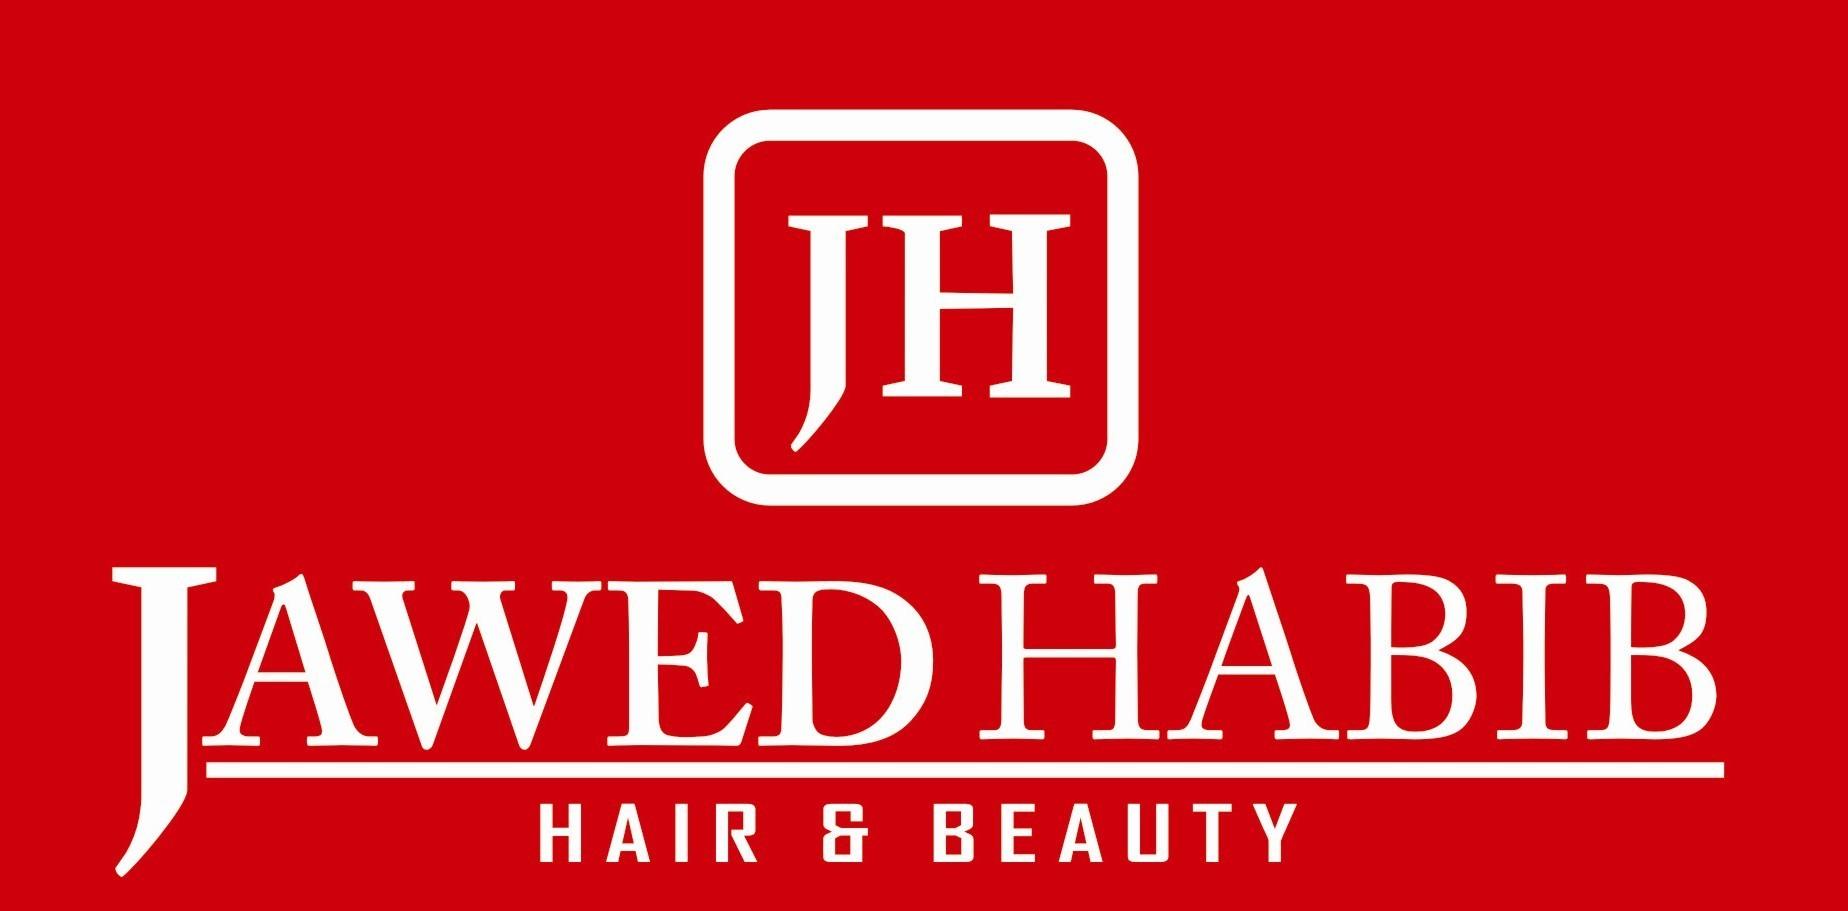 Jawed Habib Hair & Beauty Salons - Harlur - Bangalore Image